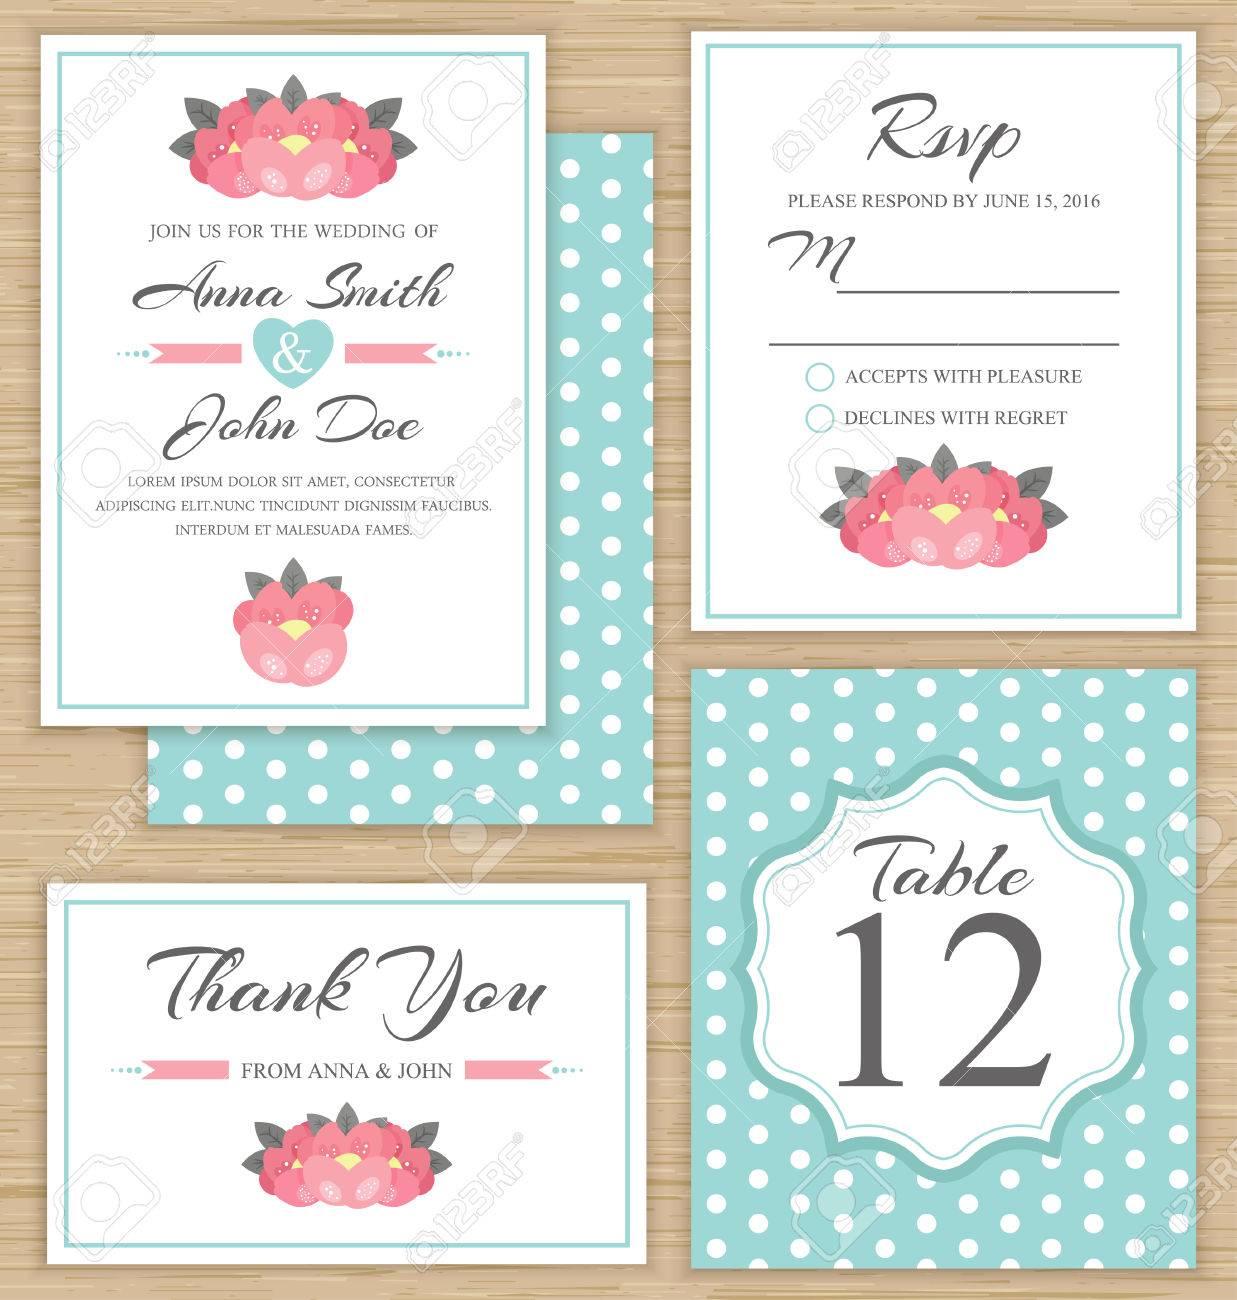 Wedding Invitation Template, Thank You Card, RSVP Card. Wedding ...